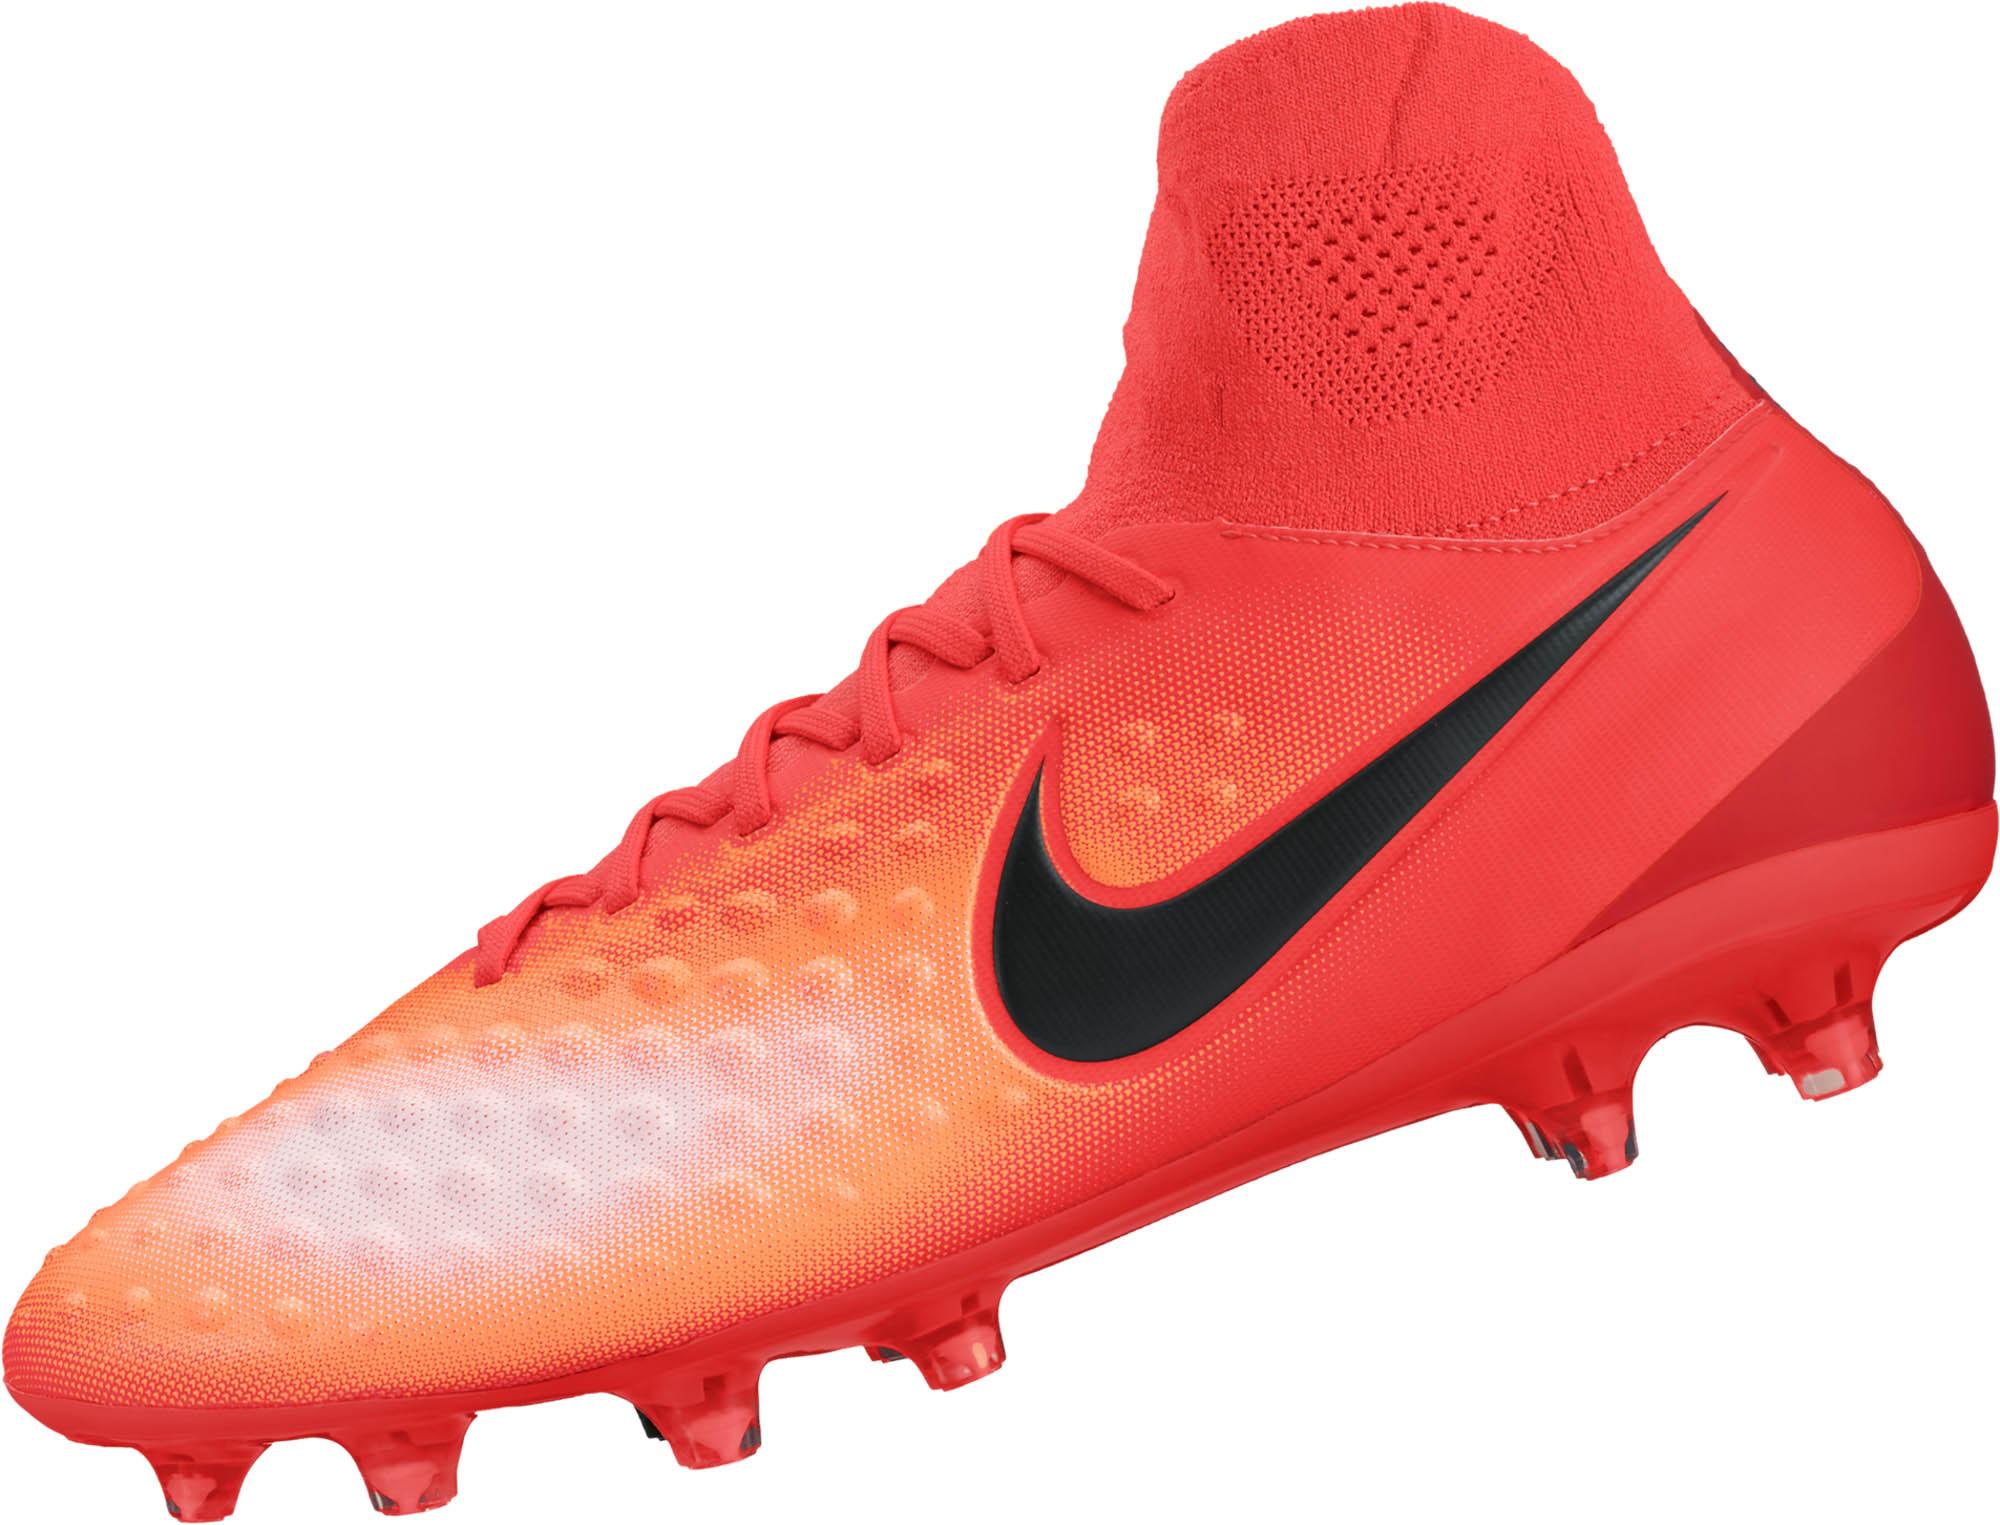 detailed look 43048 8d304 Nike Magista Orden II FG – Total Crimson University Red